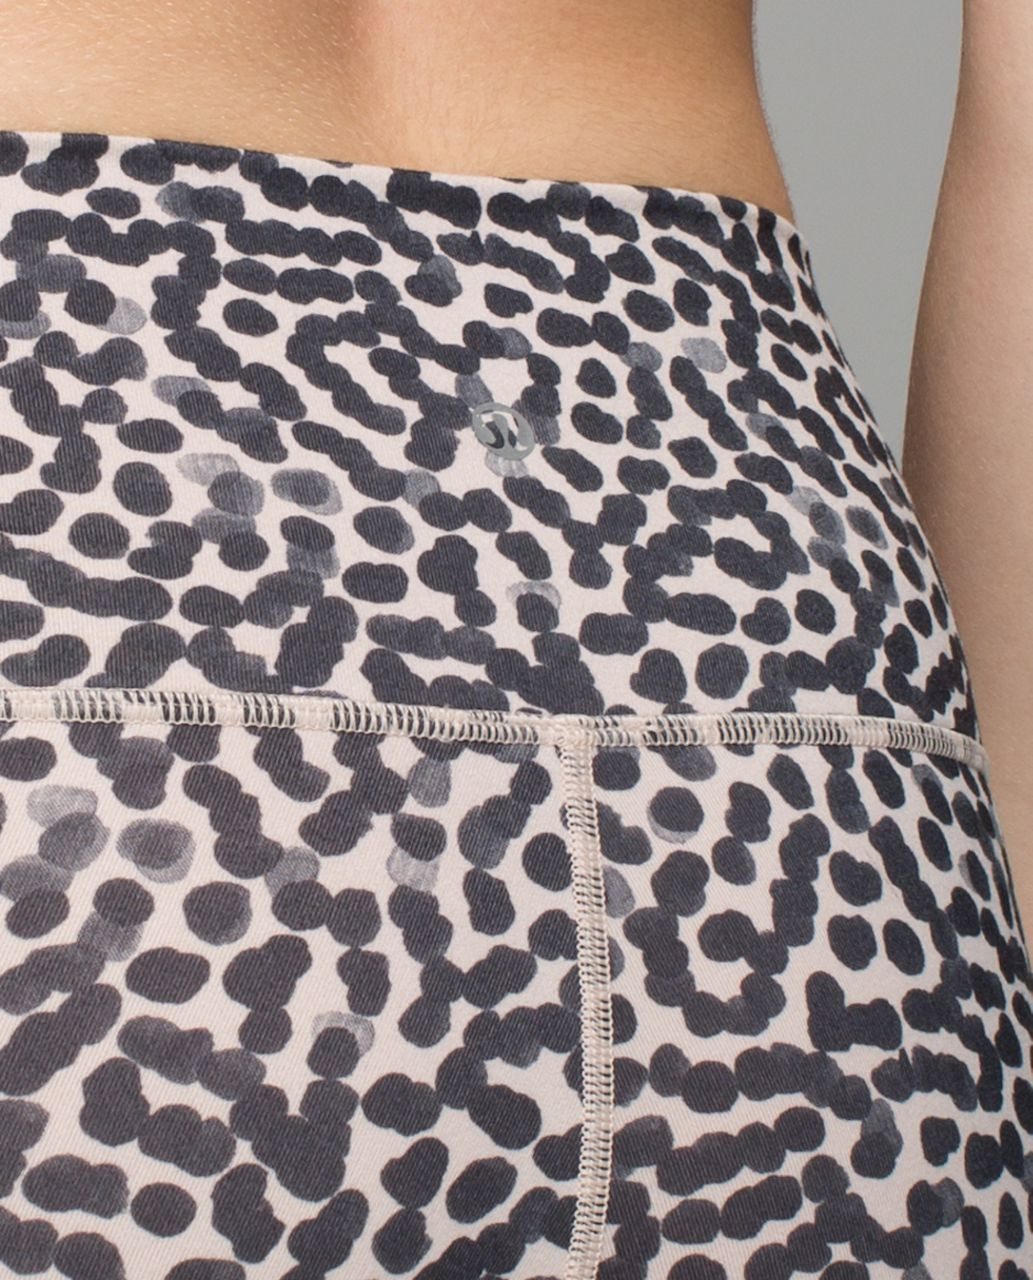 Lululemon High Times Pant *Wrap Mesh - Ace Spot Grain Black / Black